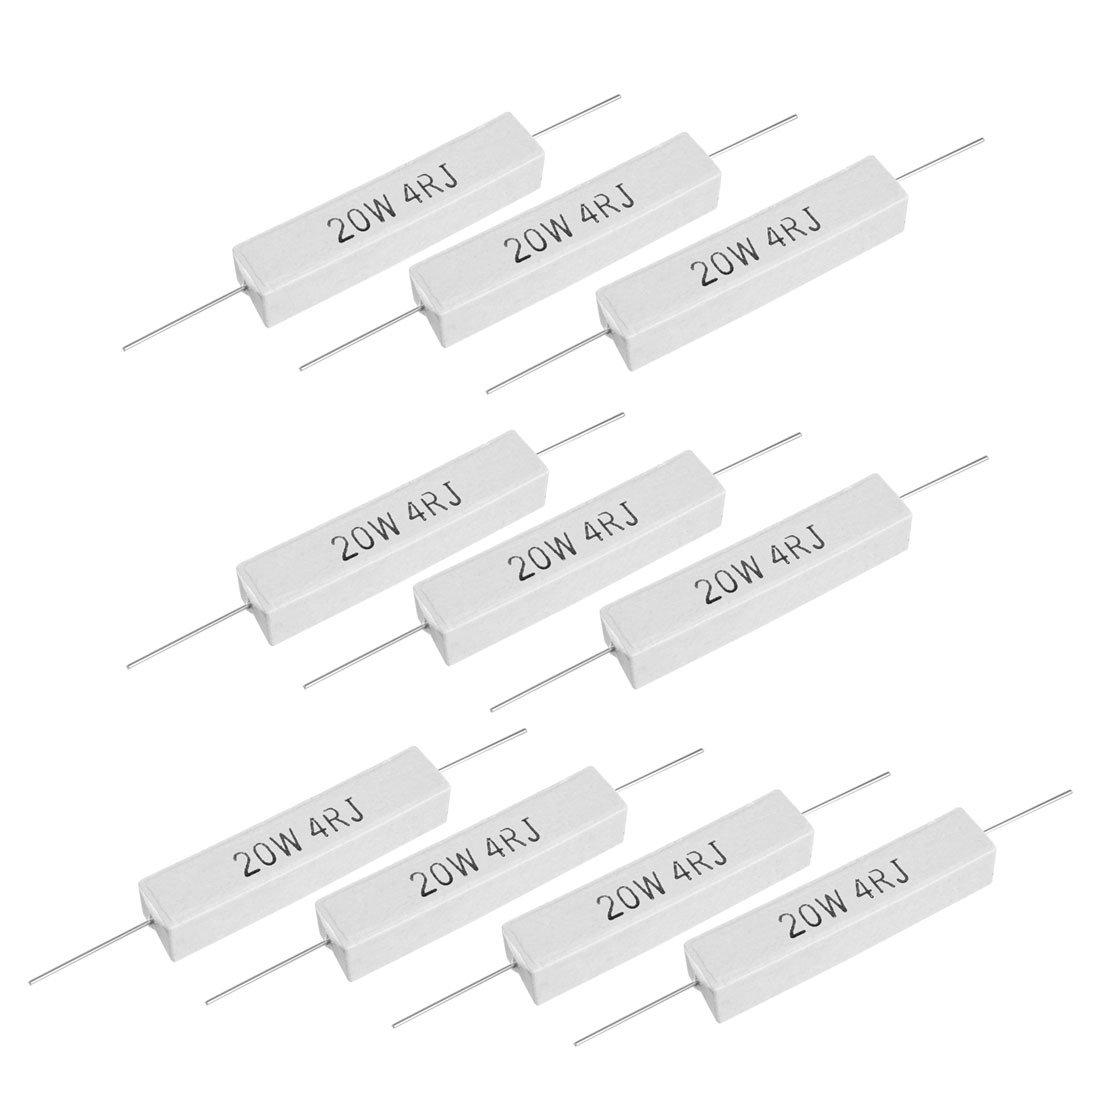 uxcell 20W 4 Ohm Power Resistor Ceramic Cement Resistor Axial Lead White 10pcs Alternators & Generators Starters & Alternators